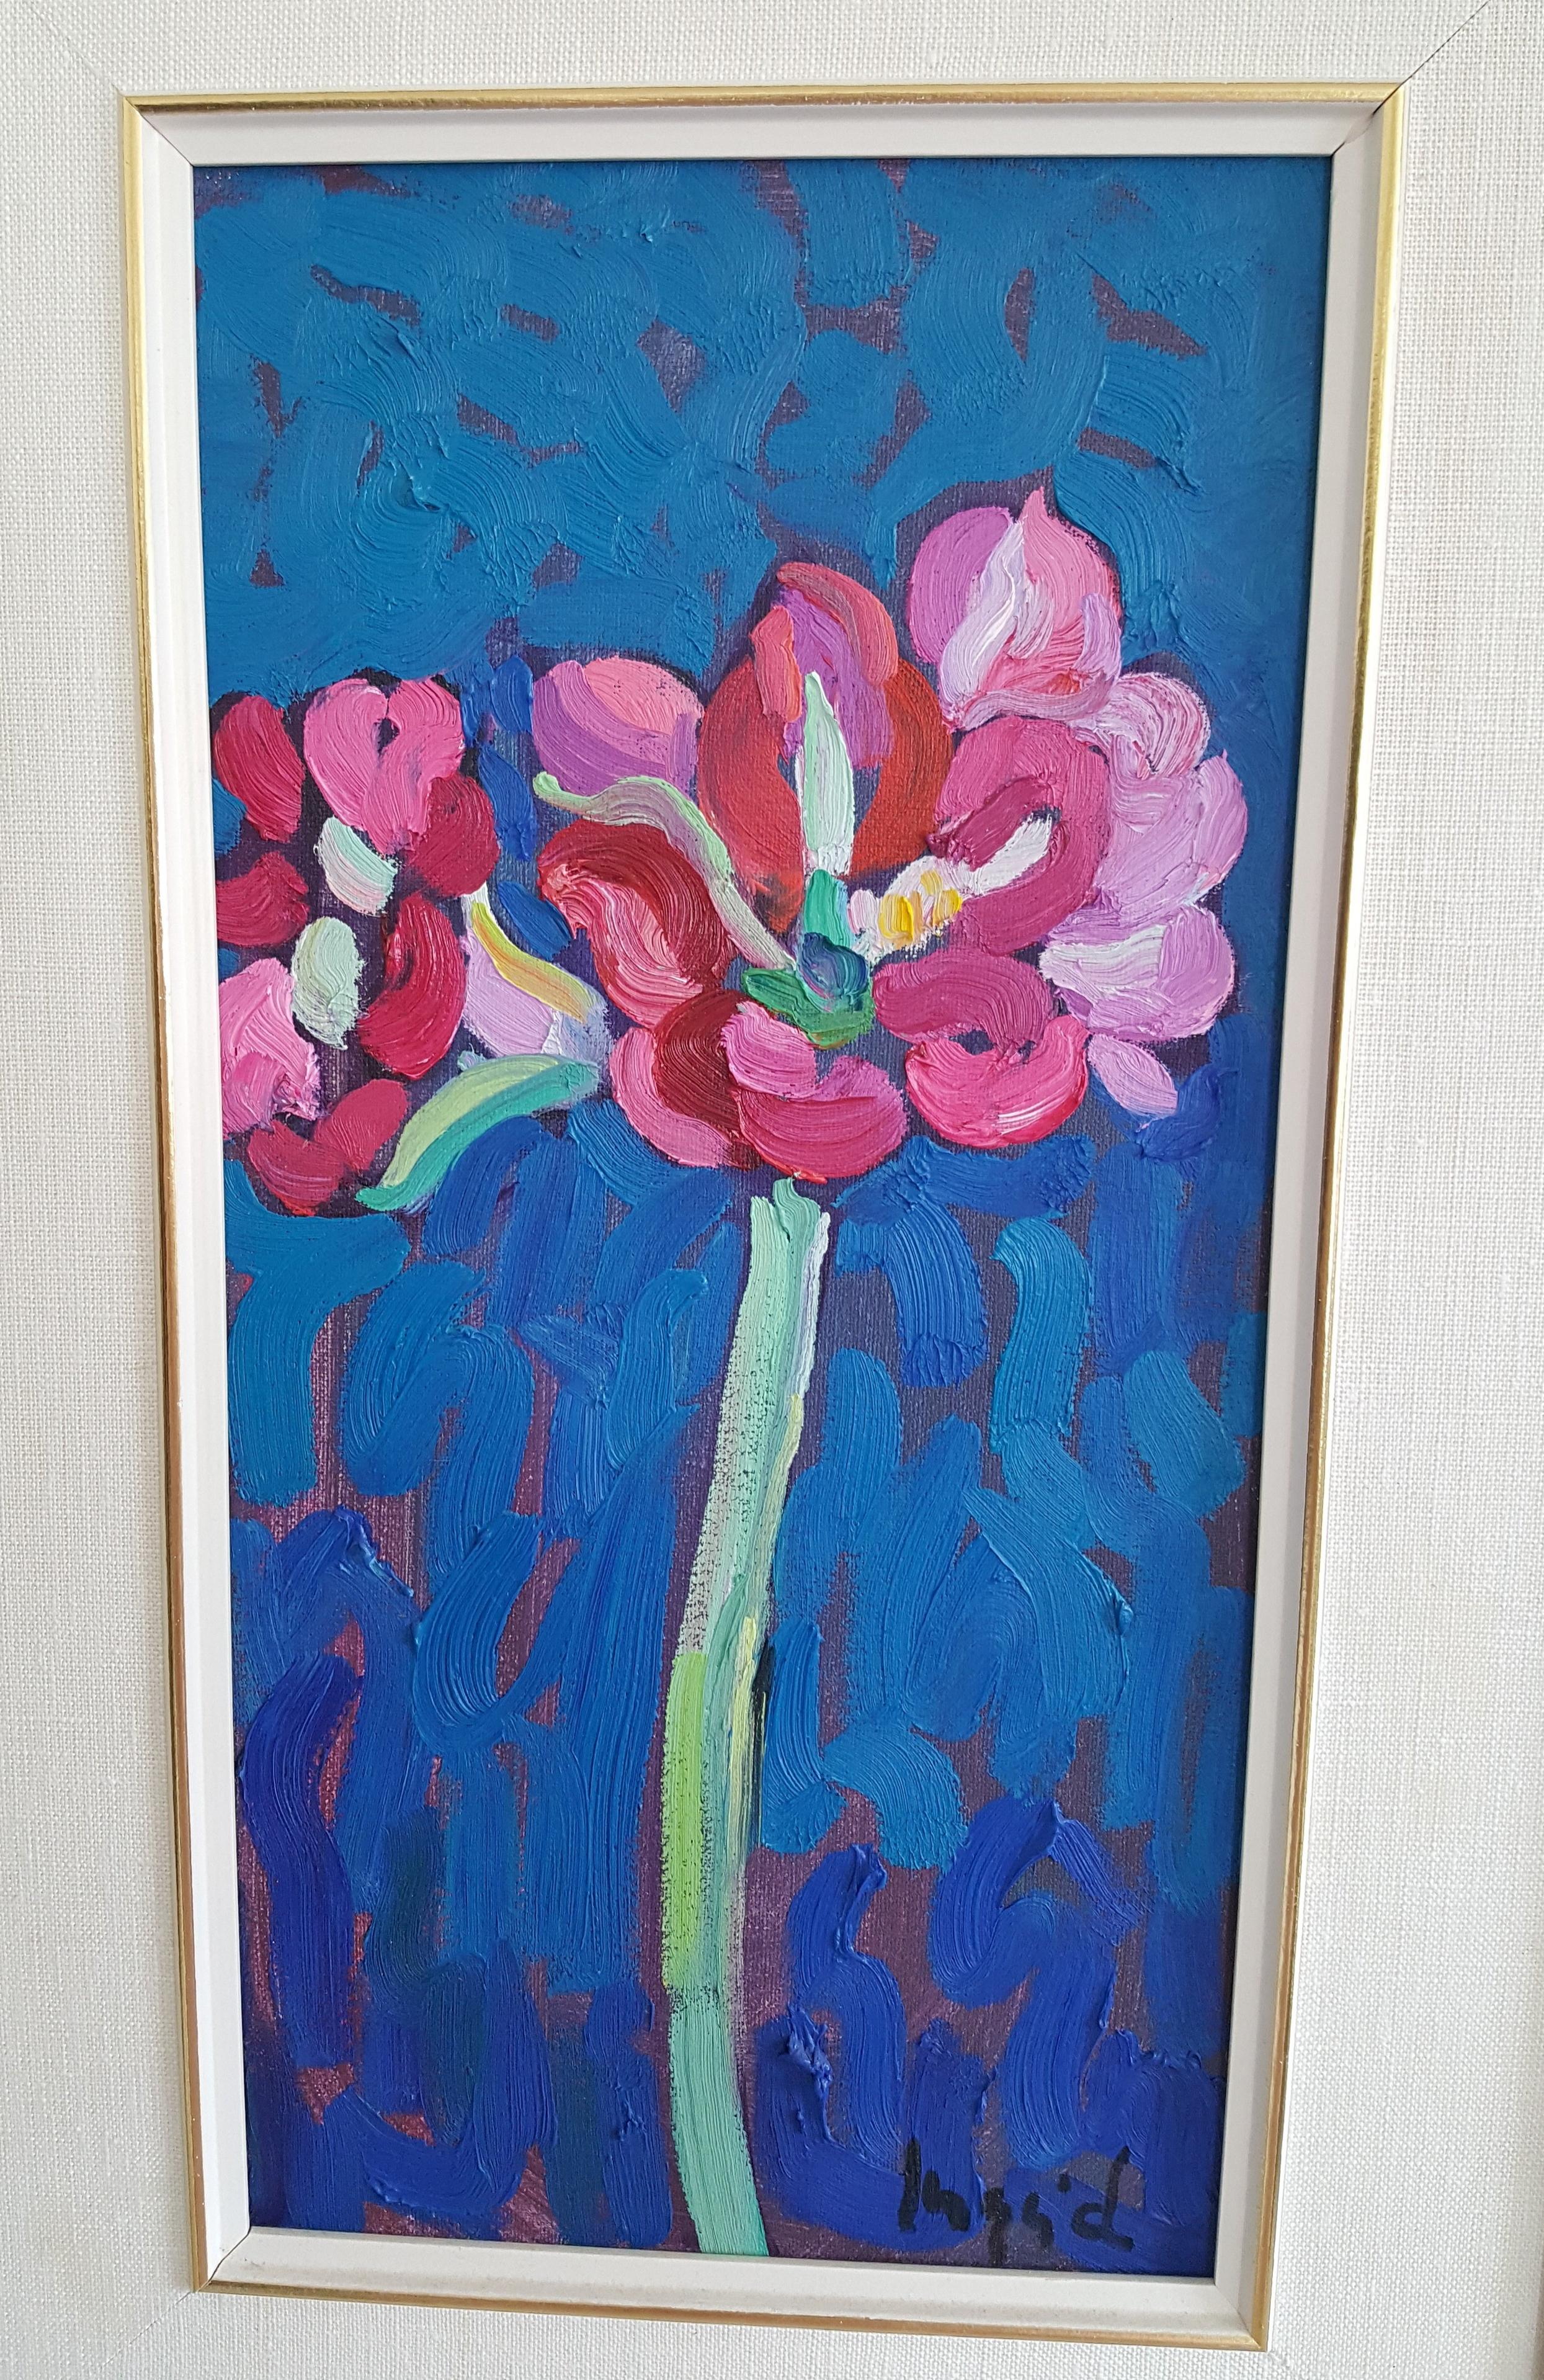 Painting by Orillia artist Ingrid Seyffer